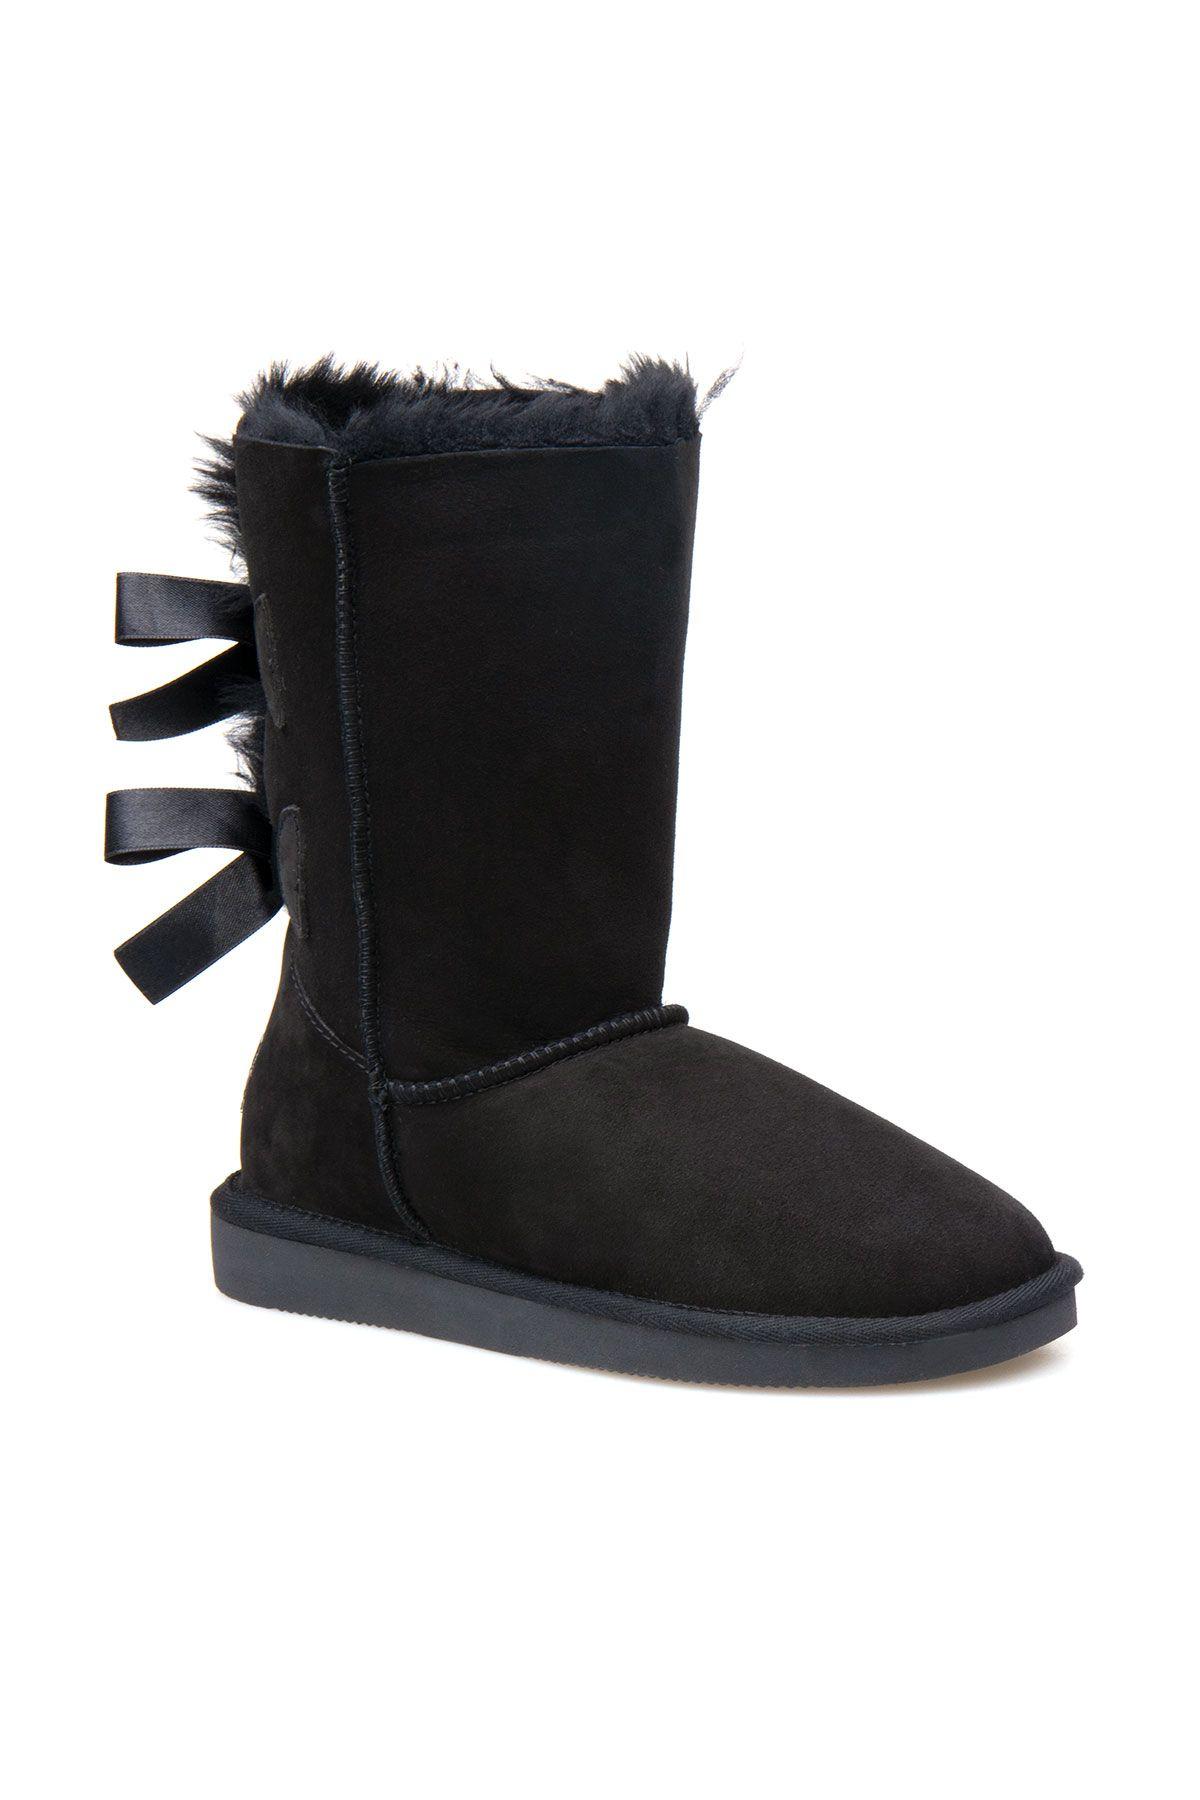 Pegia Genuine Sheepskin Women's Boots 191066 Black